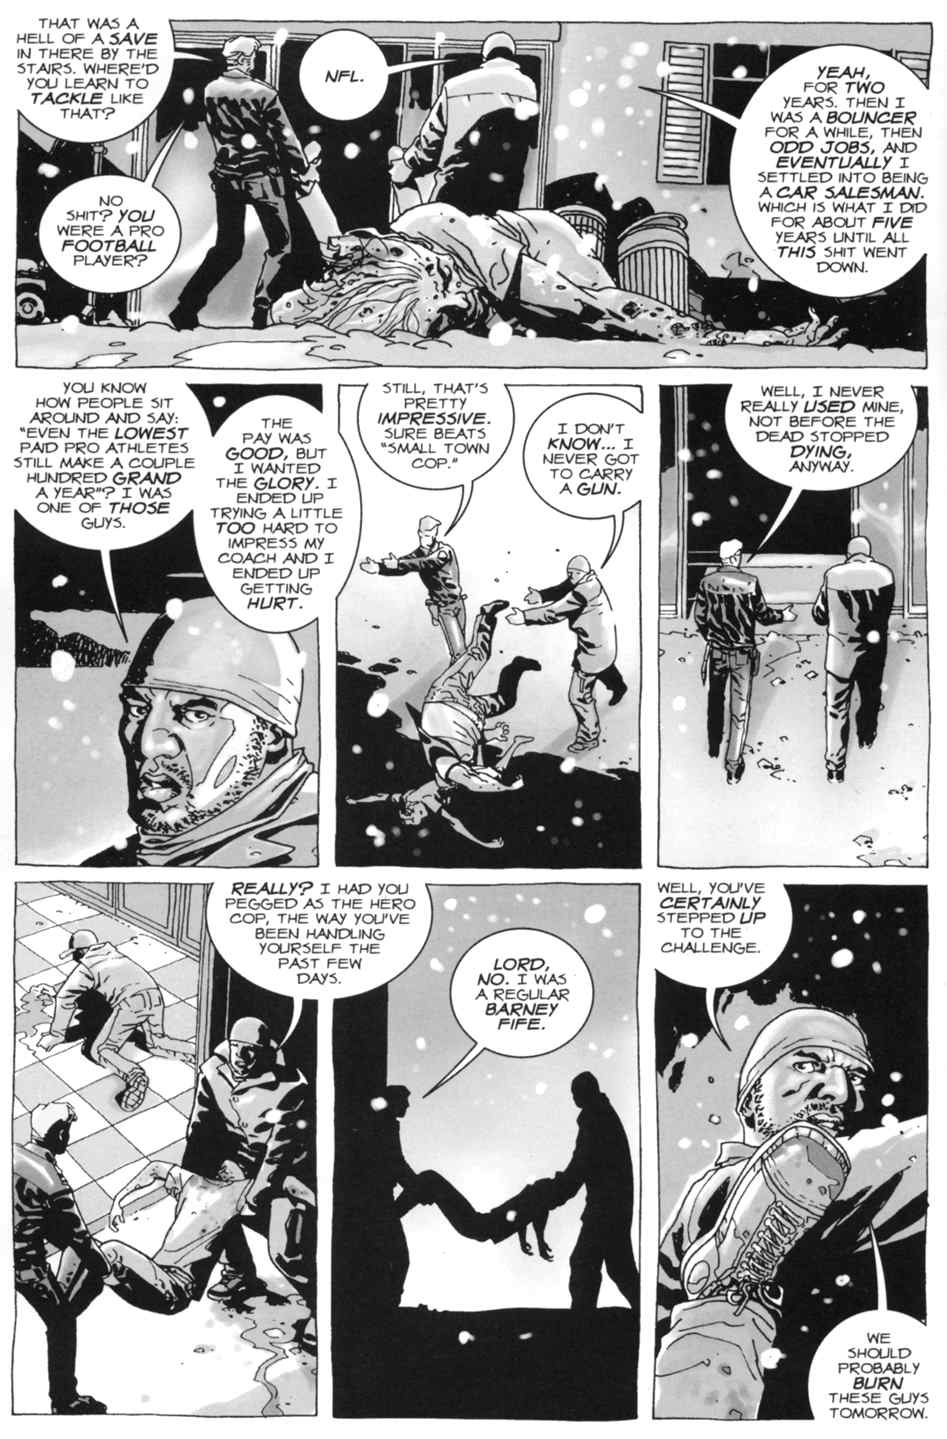 Read Comics Online Free - The Walking Dead - Chapter 008